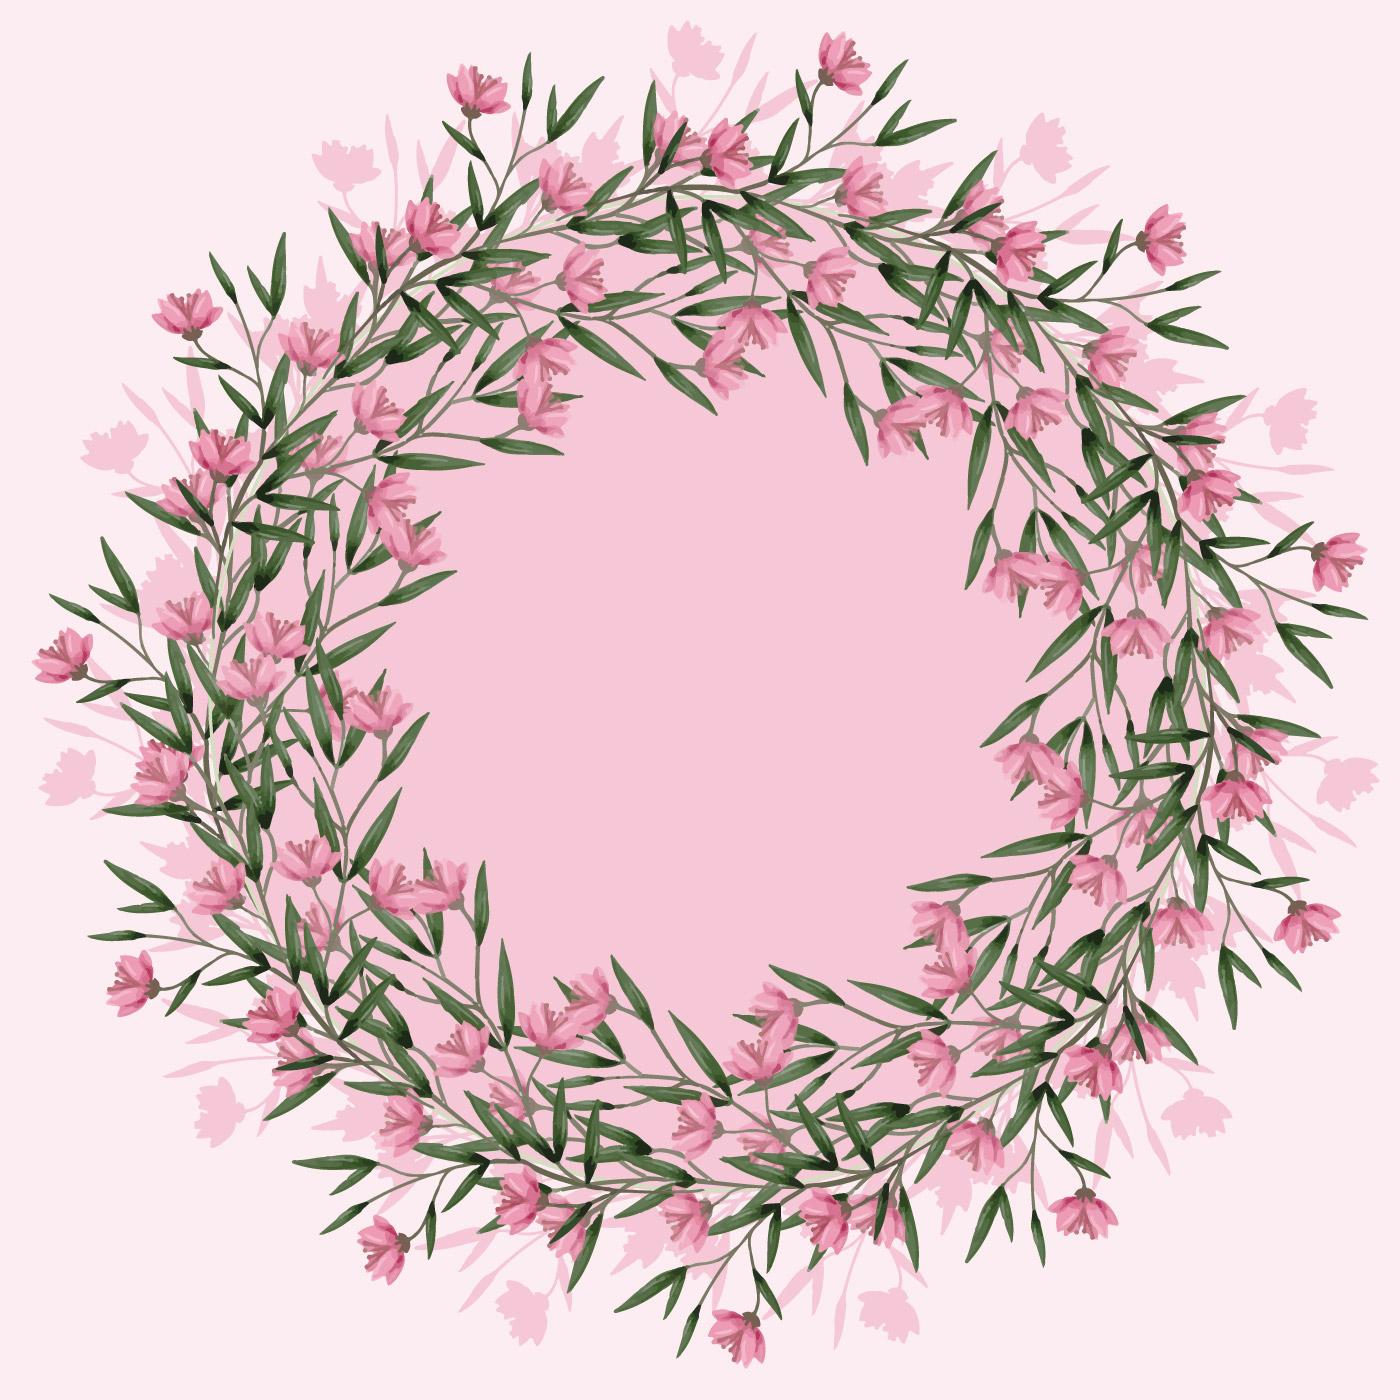 Vector Pink Floral Wreath Download Free Vector Art Stock Graphics